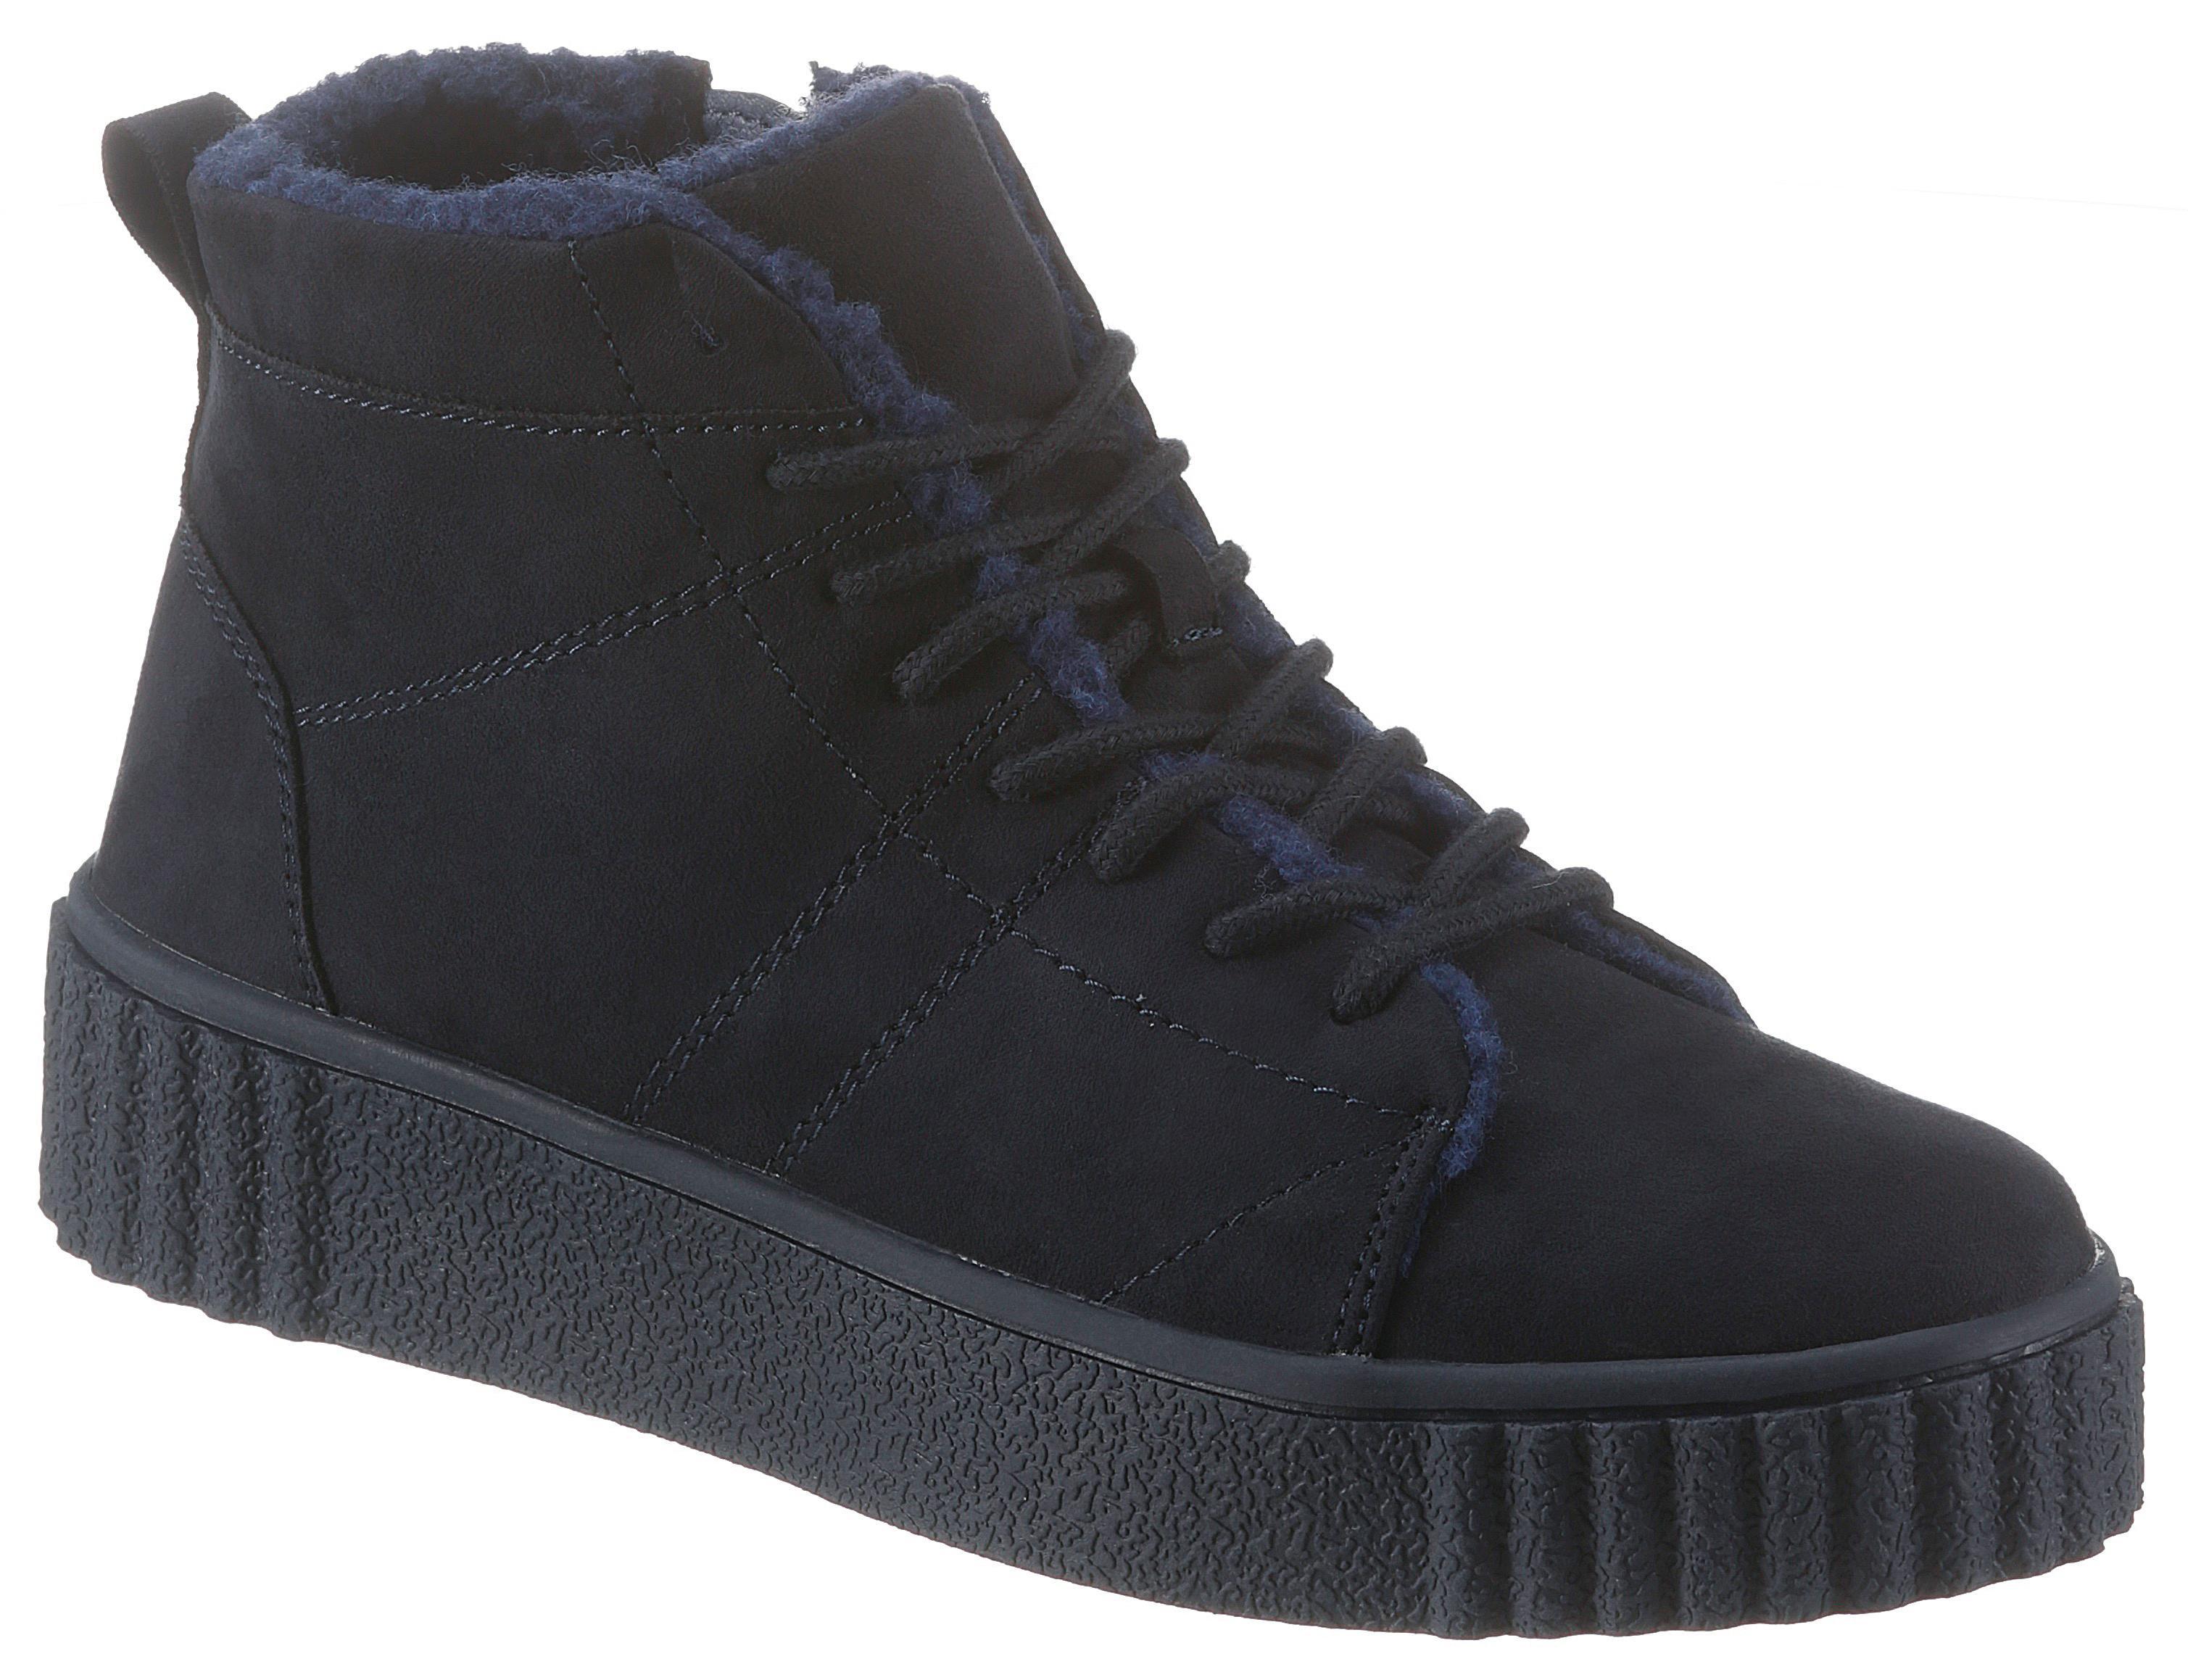 CITY WALK Winterboots | Schuhe > Boots | City Walk